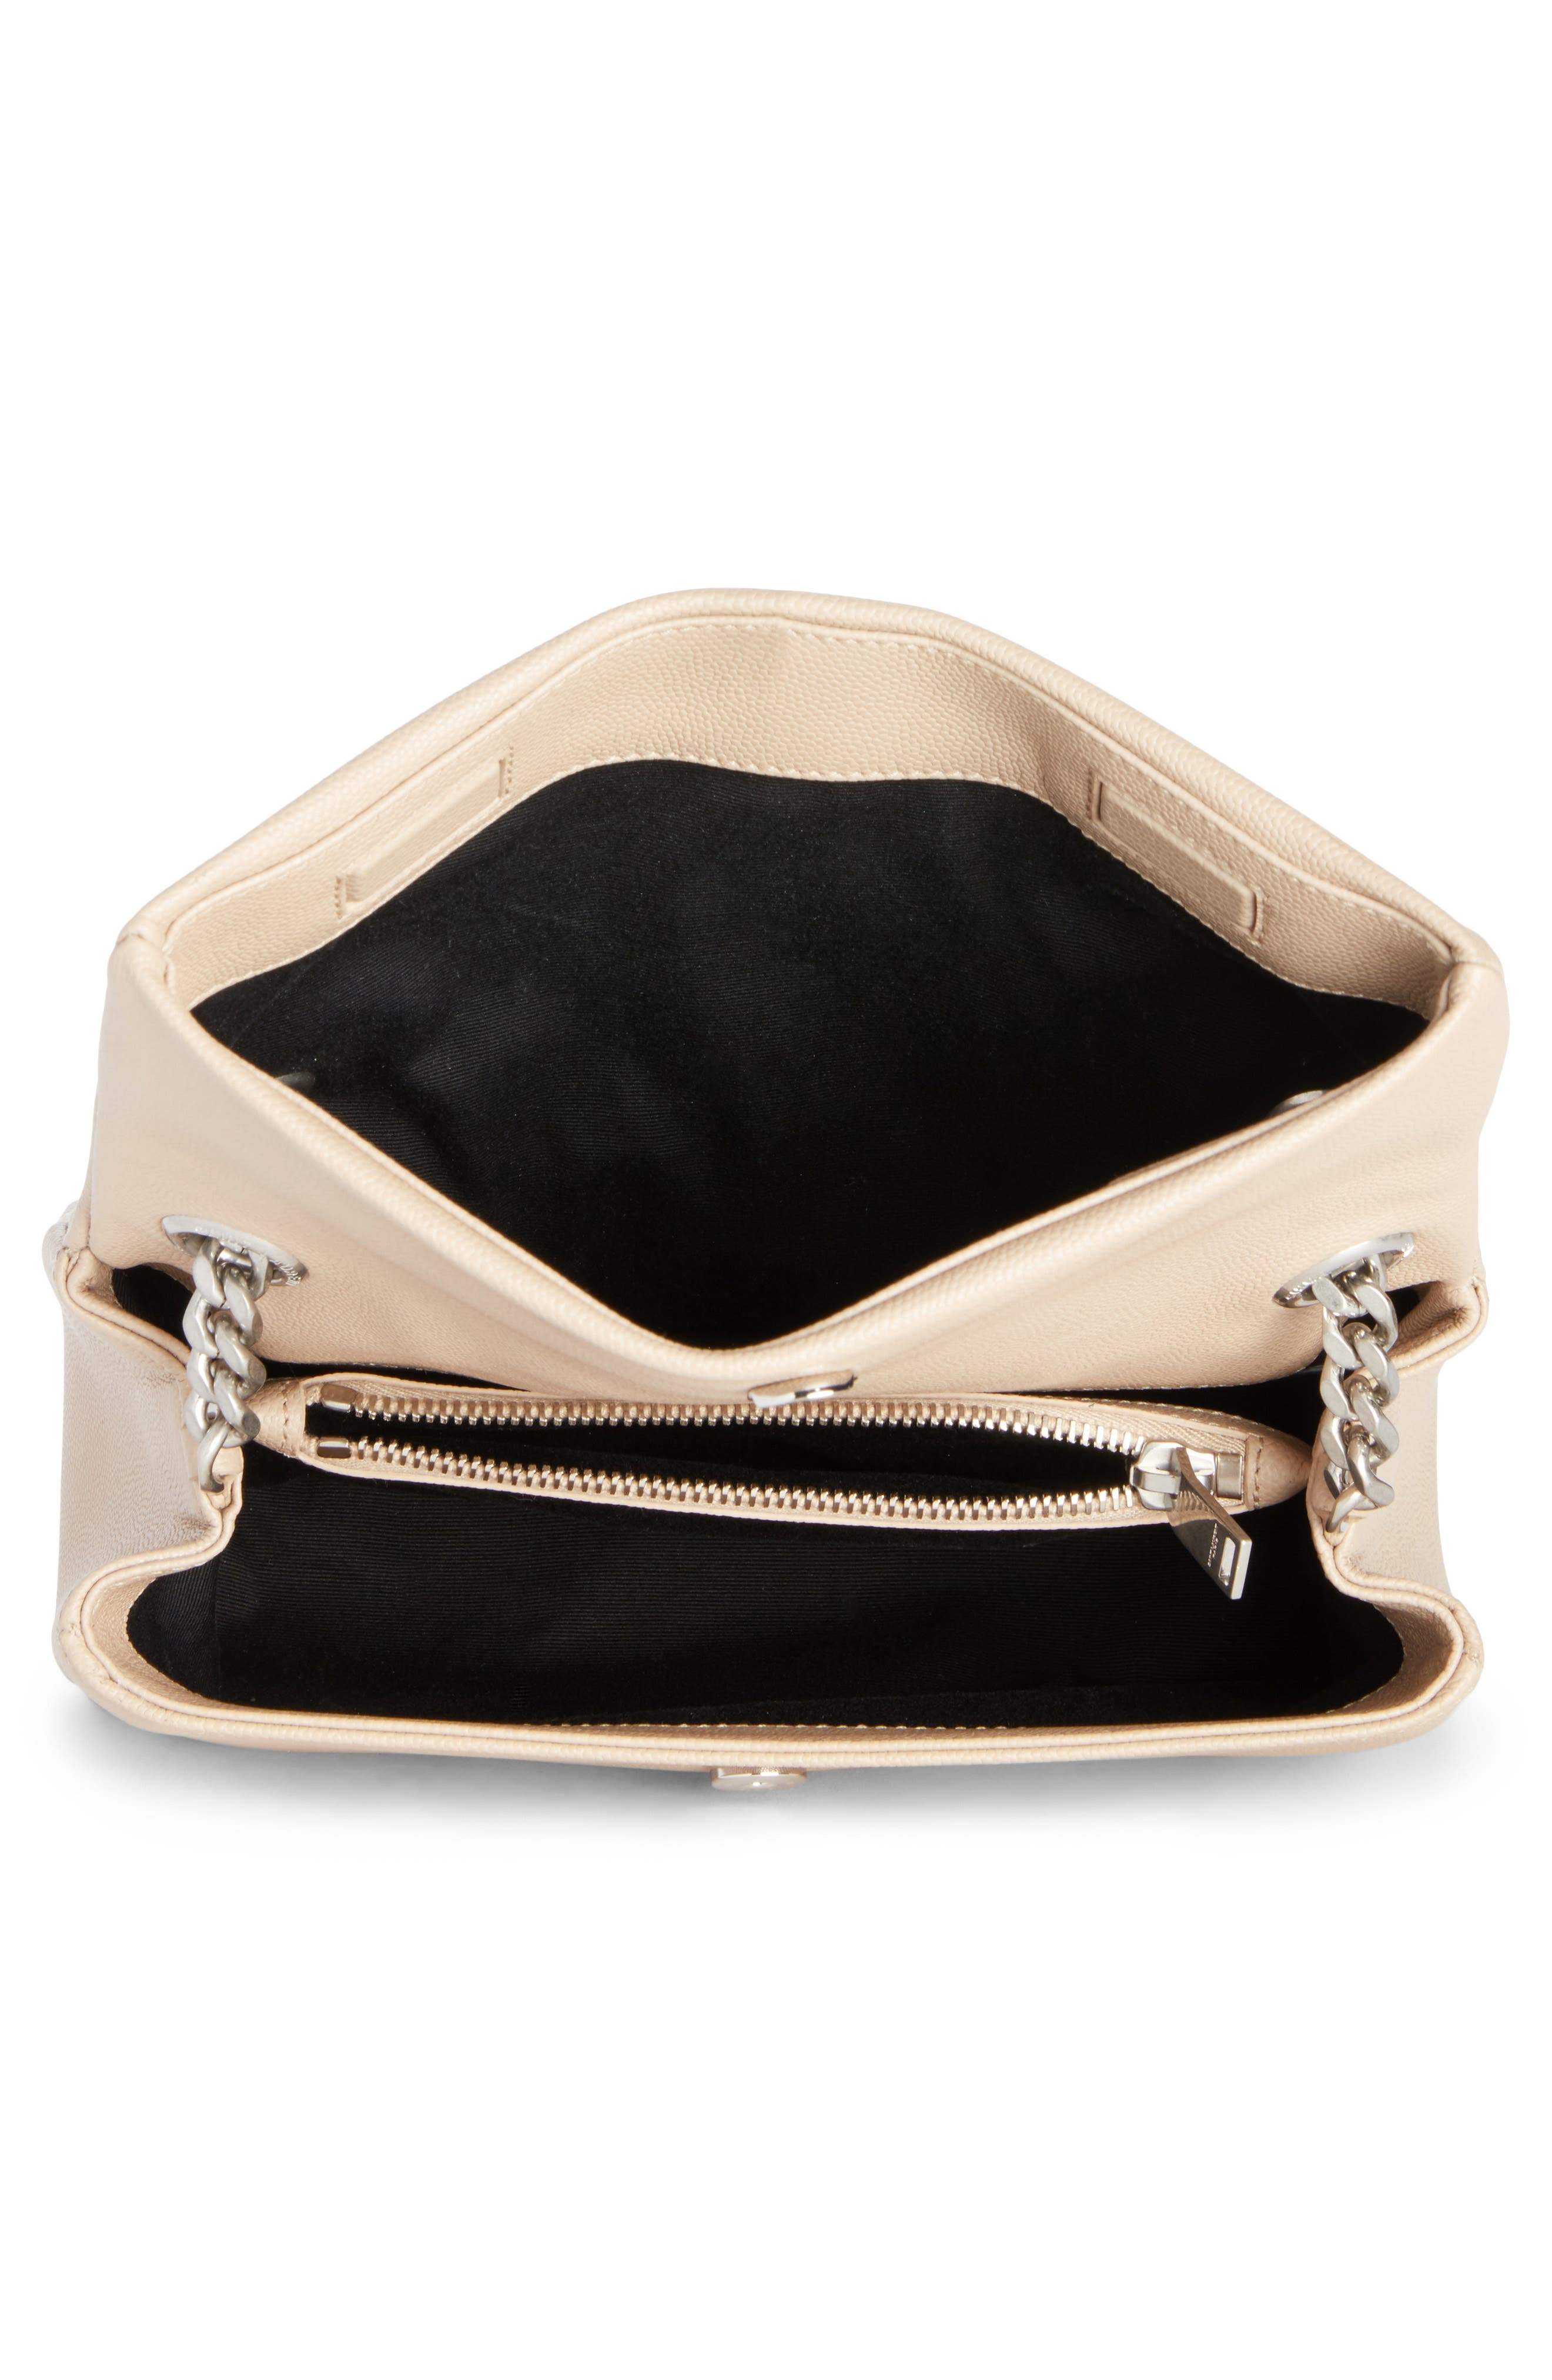 West Hollywood Calfskin Leather Messenger Bag,                             Alternate thumbnail 14, color,